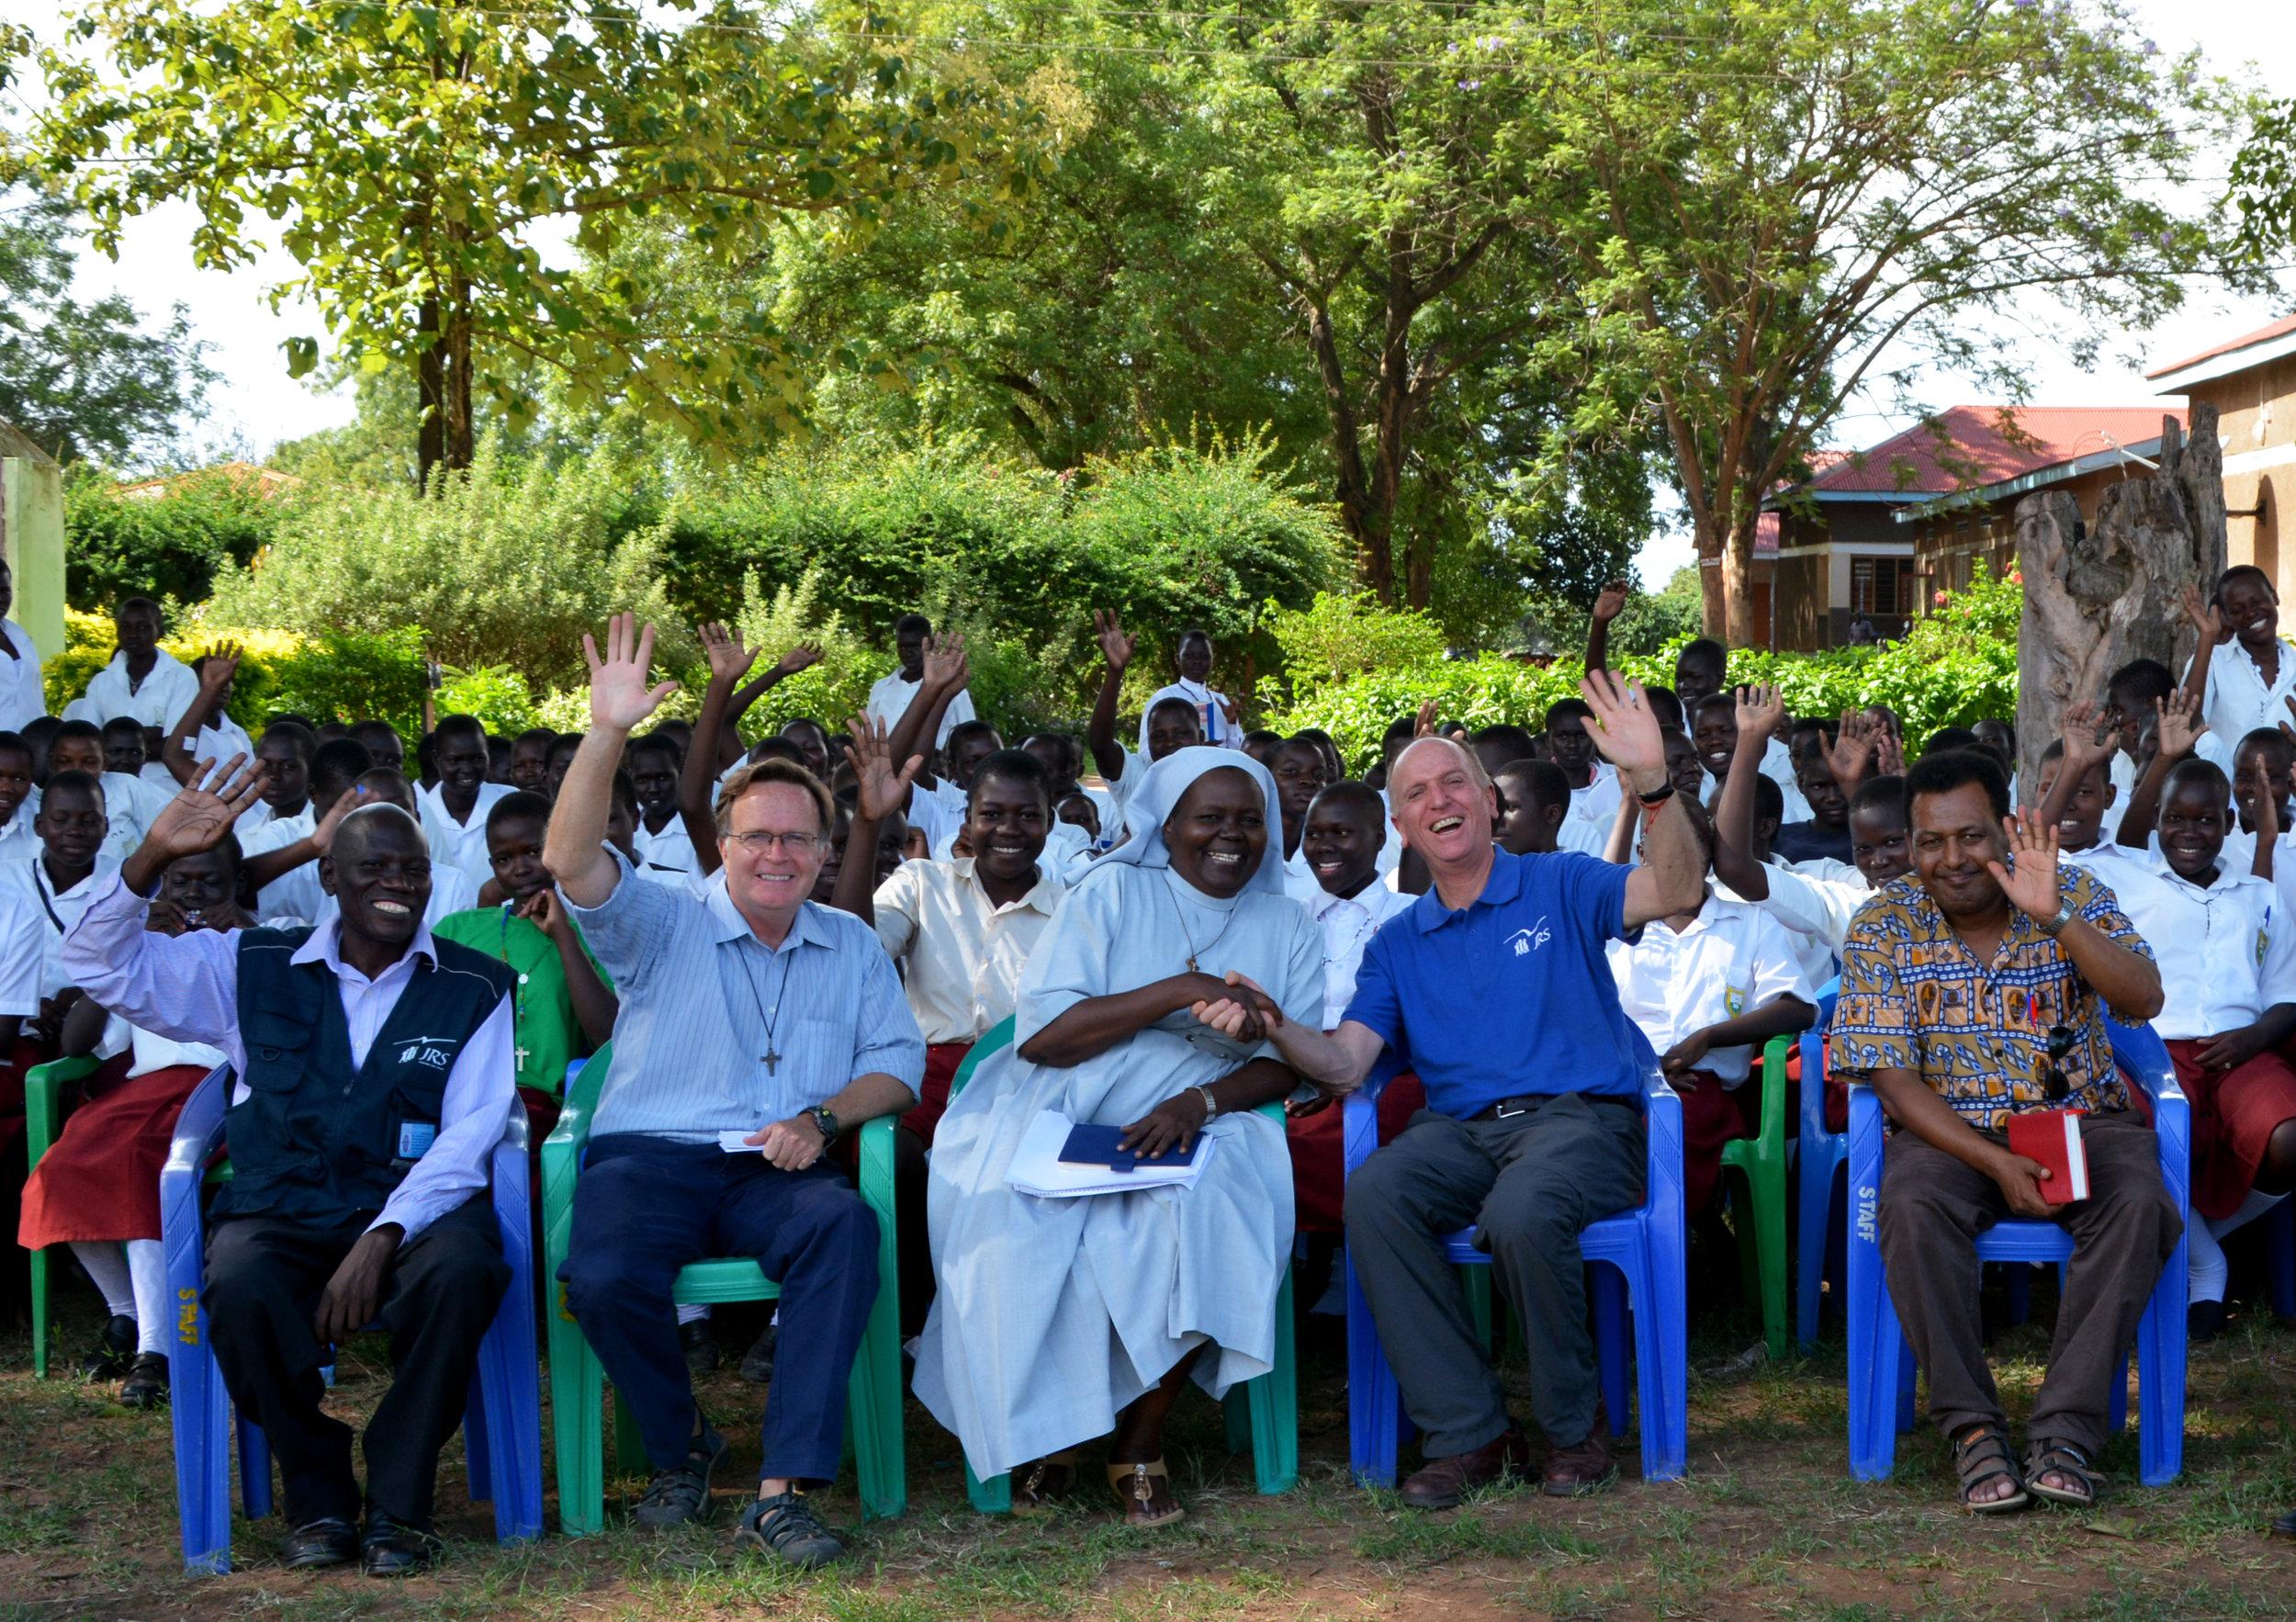 JRS International Director, Rev. Thomas H. Smolich S.J. (in dark blue), visiting St. Mary Assumpta in uganda, where JRS provides scholarships, teacher training & school supplies (photo by JRS International)